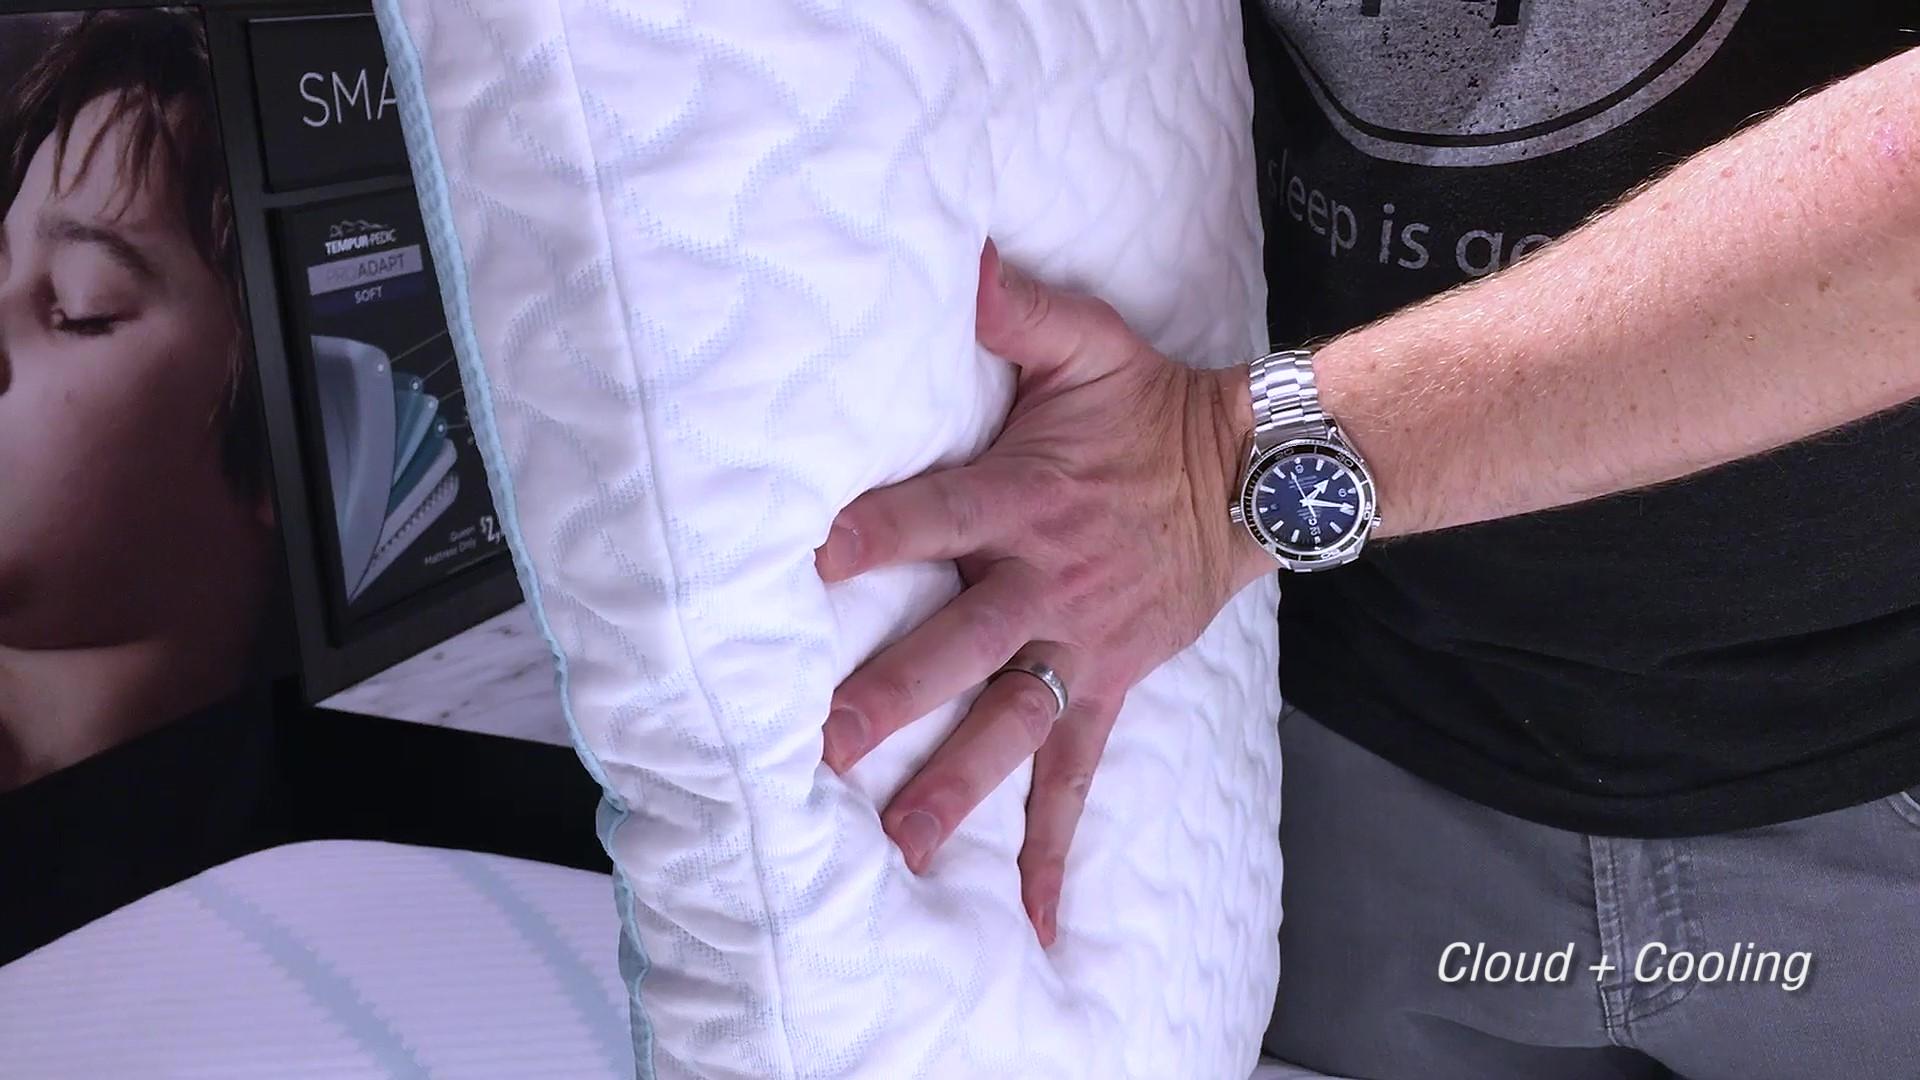 Tempur-Adapt Cloud + Cooling Pillow